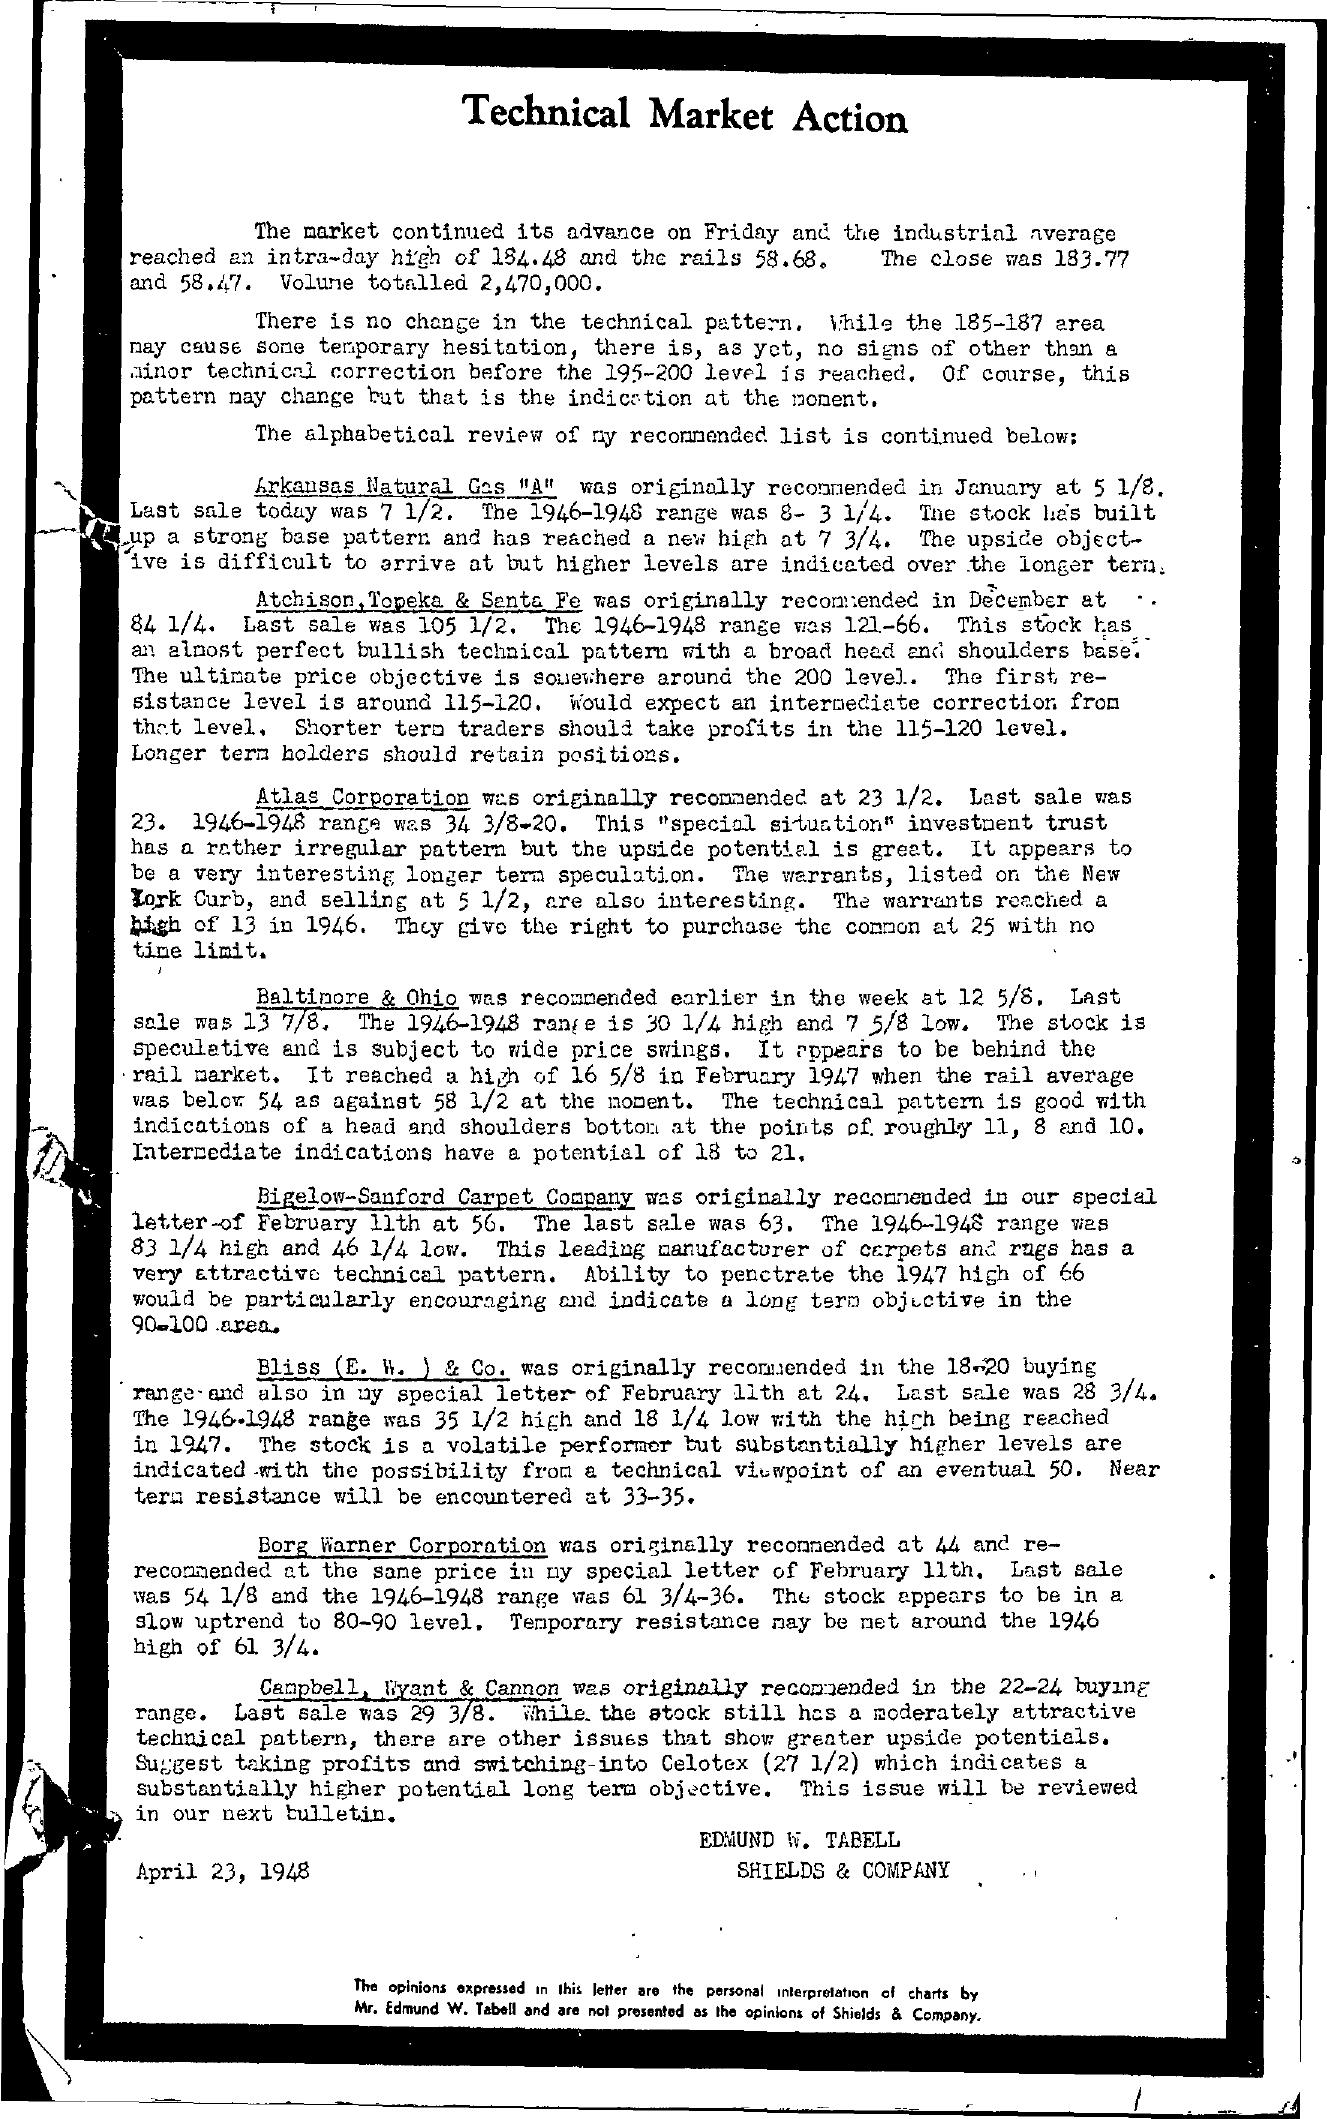 Tabell's Market Letter - April 23, 1948